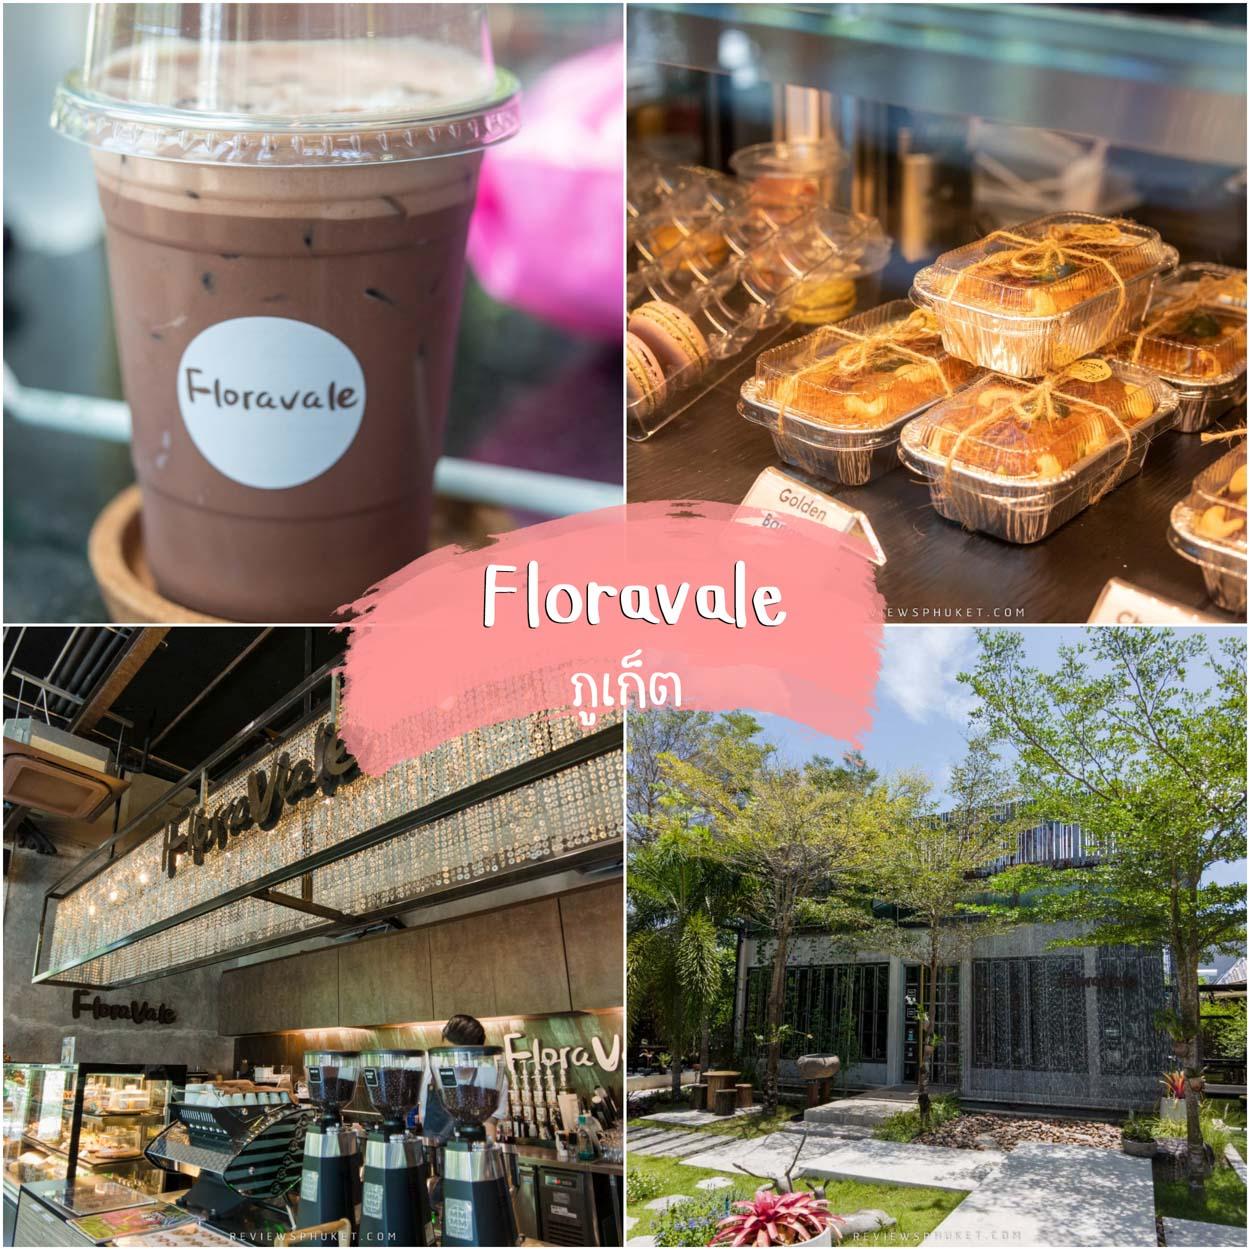 FloraVale Coffee & Pastry คาเฟ่ภูเก็ต จุดเด่นคือมีทั้งเครื่องดื่มและเบเกอรี่แบบจุกๆเต็มตู้